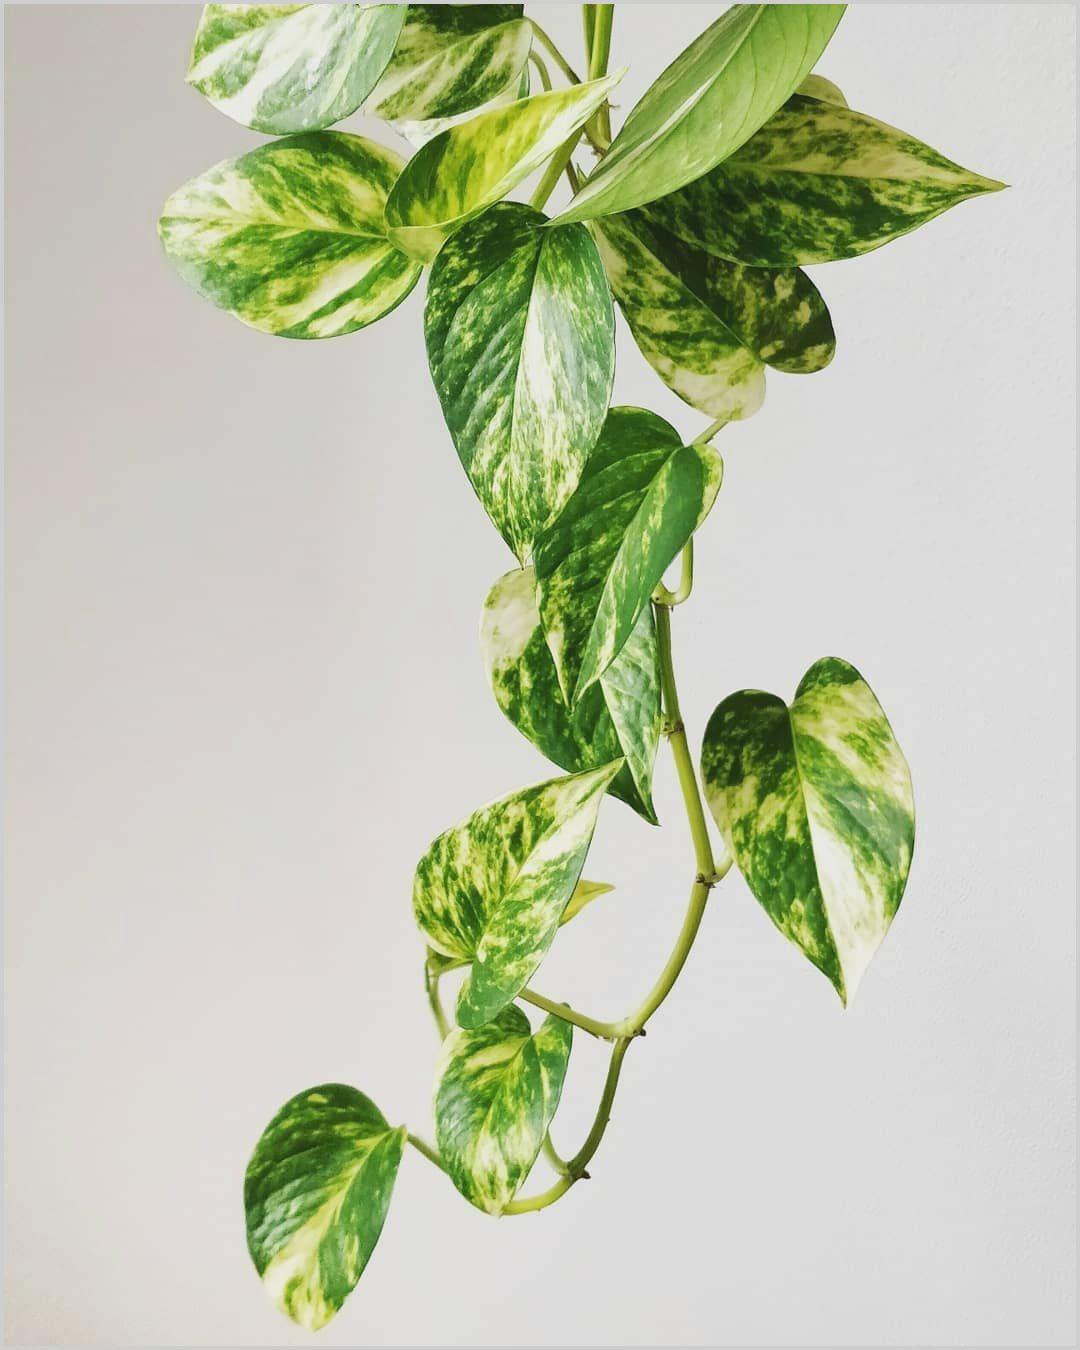 Money Plant Decoration In Living Room In 2020 Indoor Tree Plants Variegated Plants Growing Plants Indoors